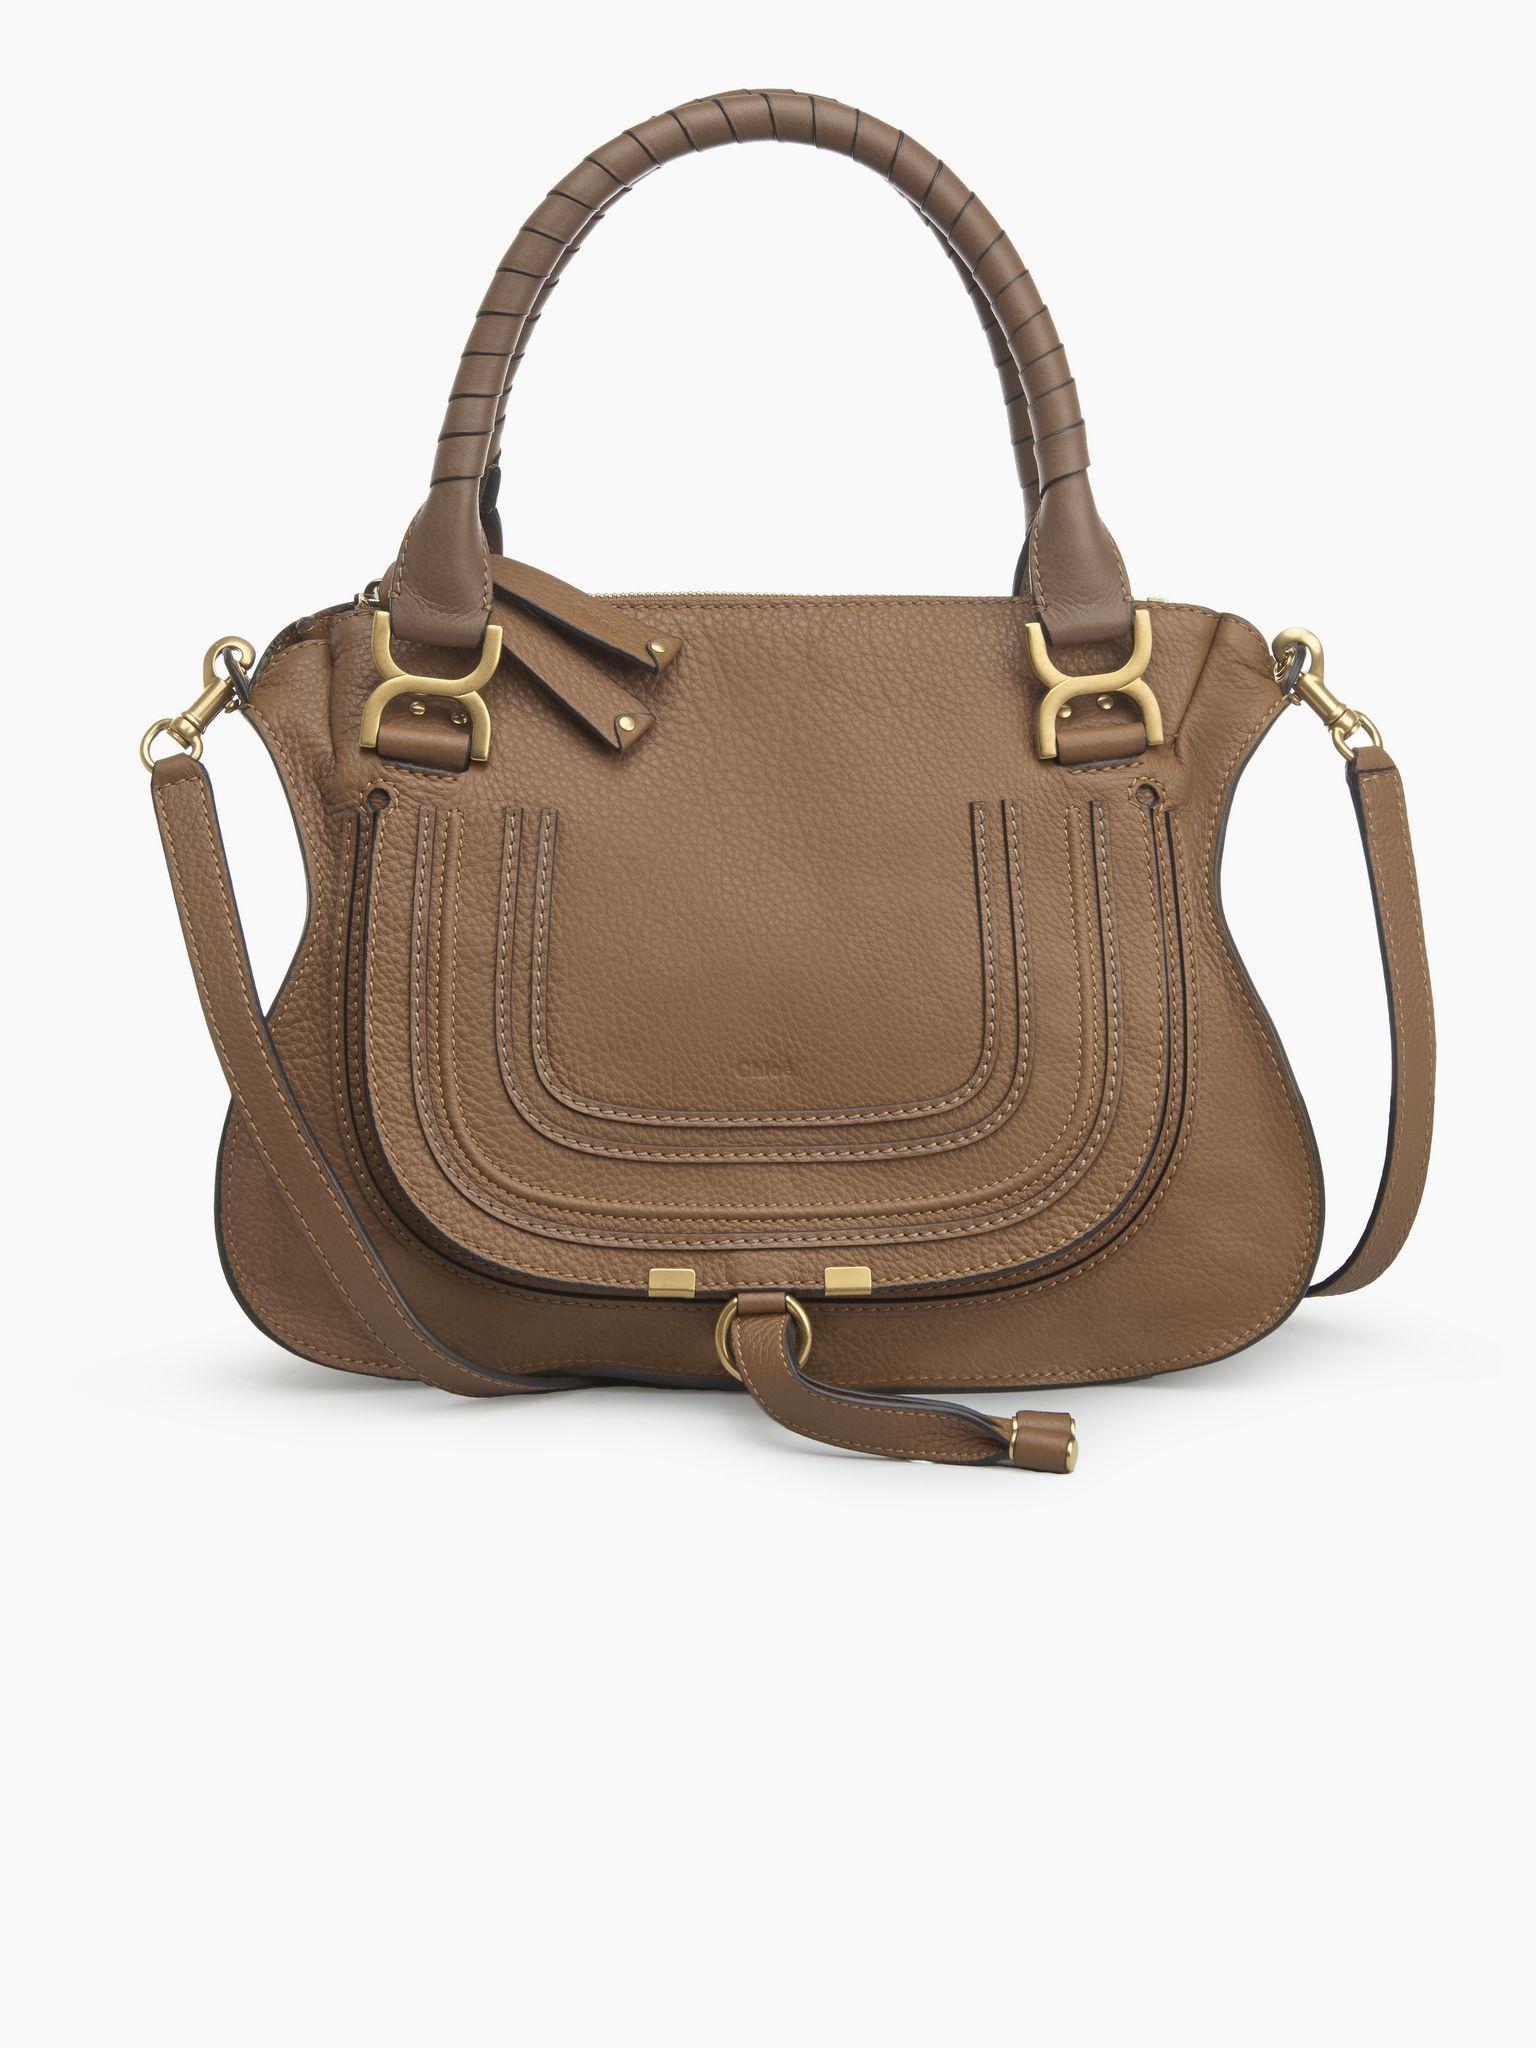 Marcie Handbag   Chloé Official Website   3S0860-161-174   Chloe ...